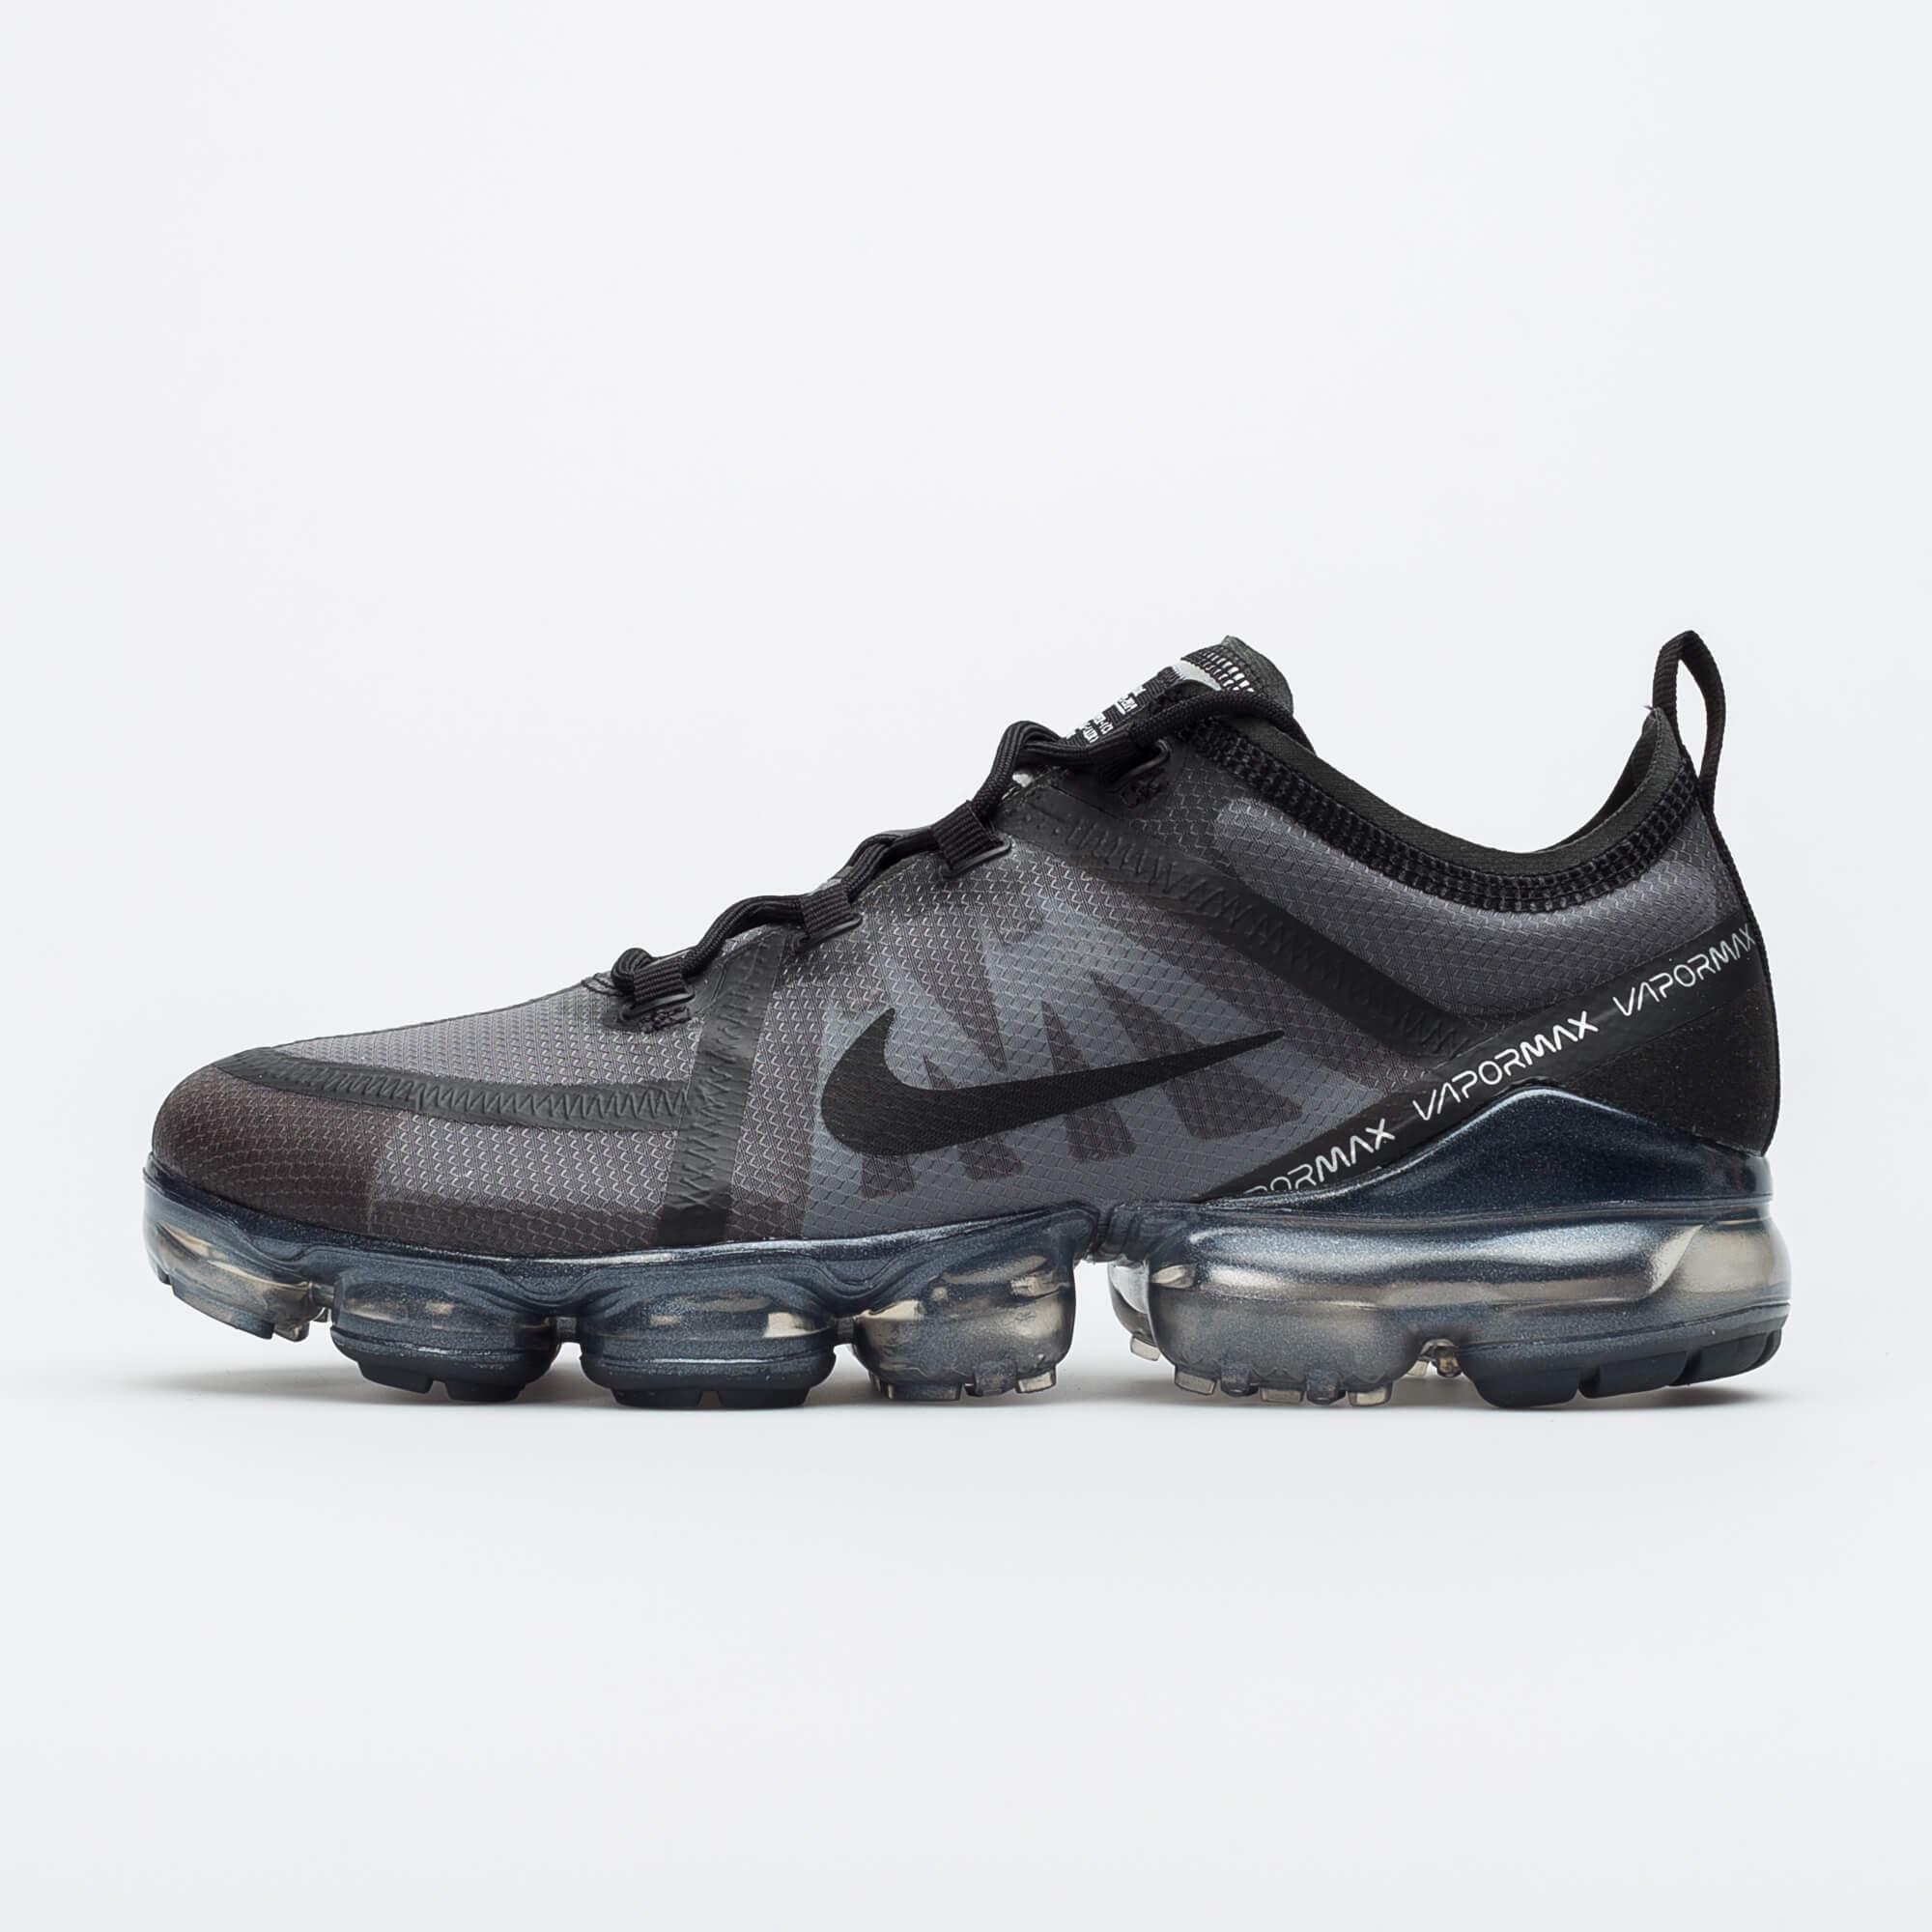 Nike Sues Skechers Over